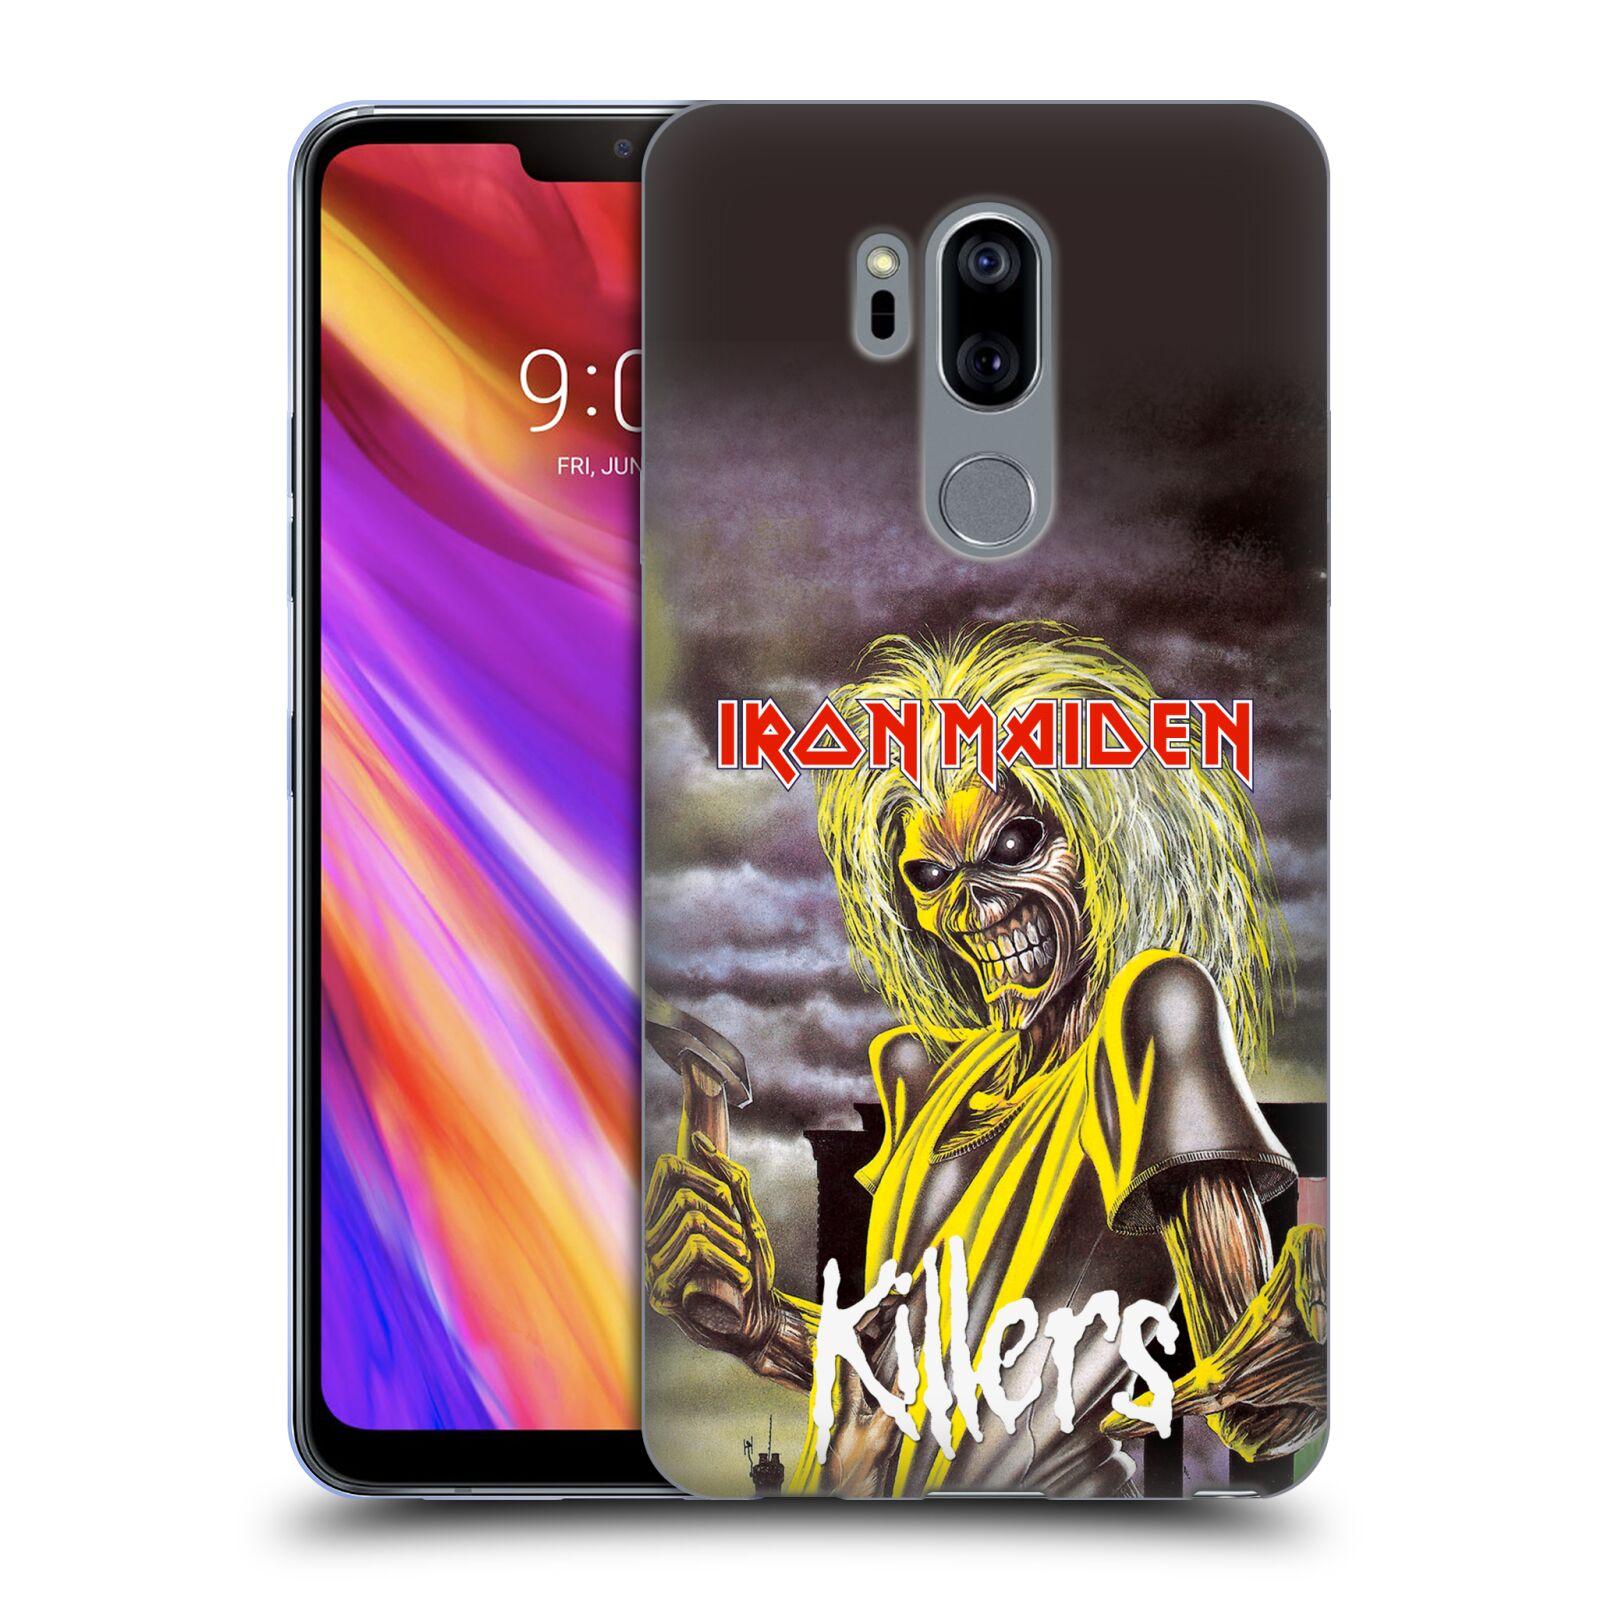 Silikonové pouzdro na mobil LG G7 ThinQ - Head Case - Iron Maiden - Killers  ( 36a3b8e8607